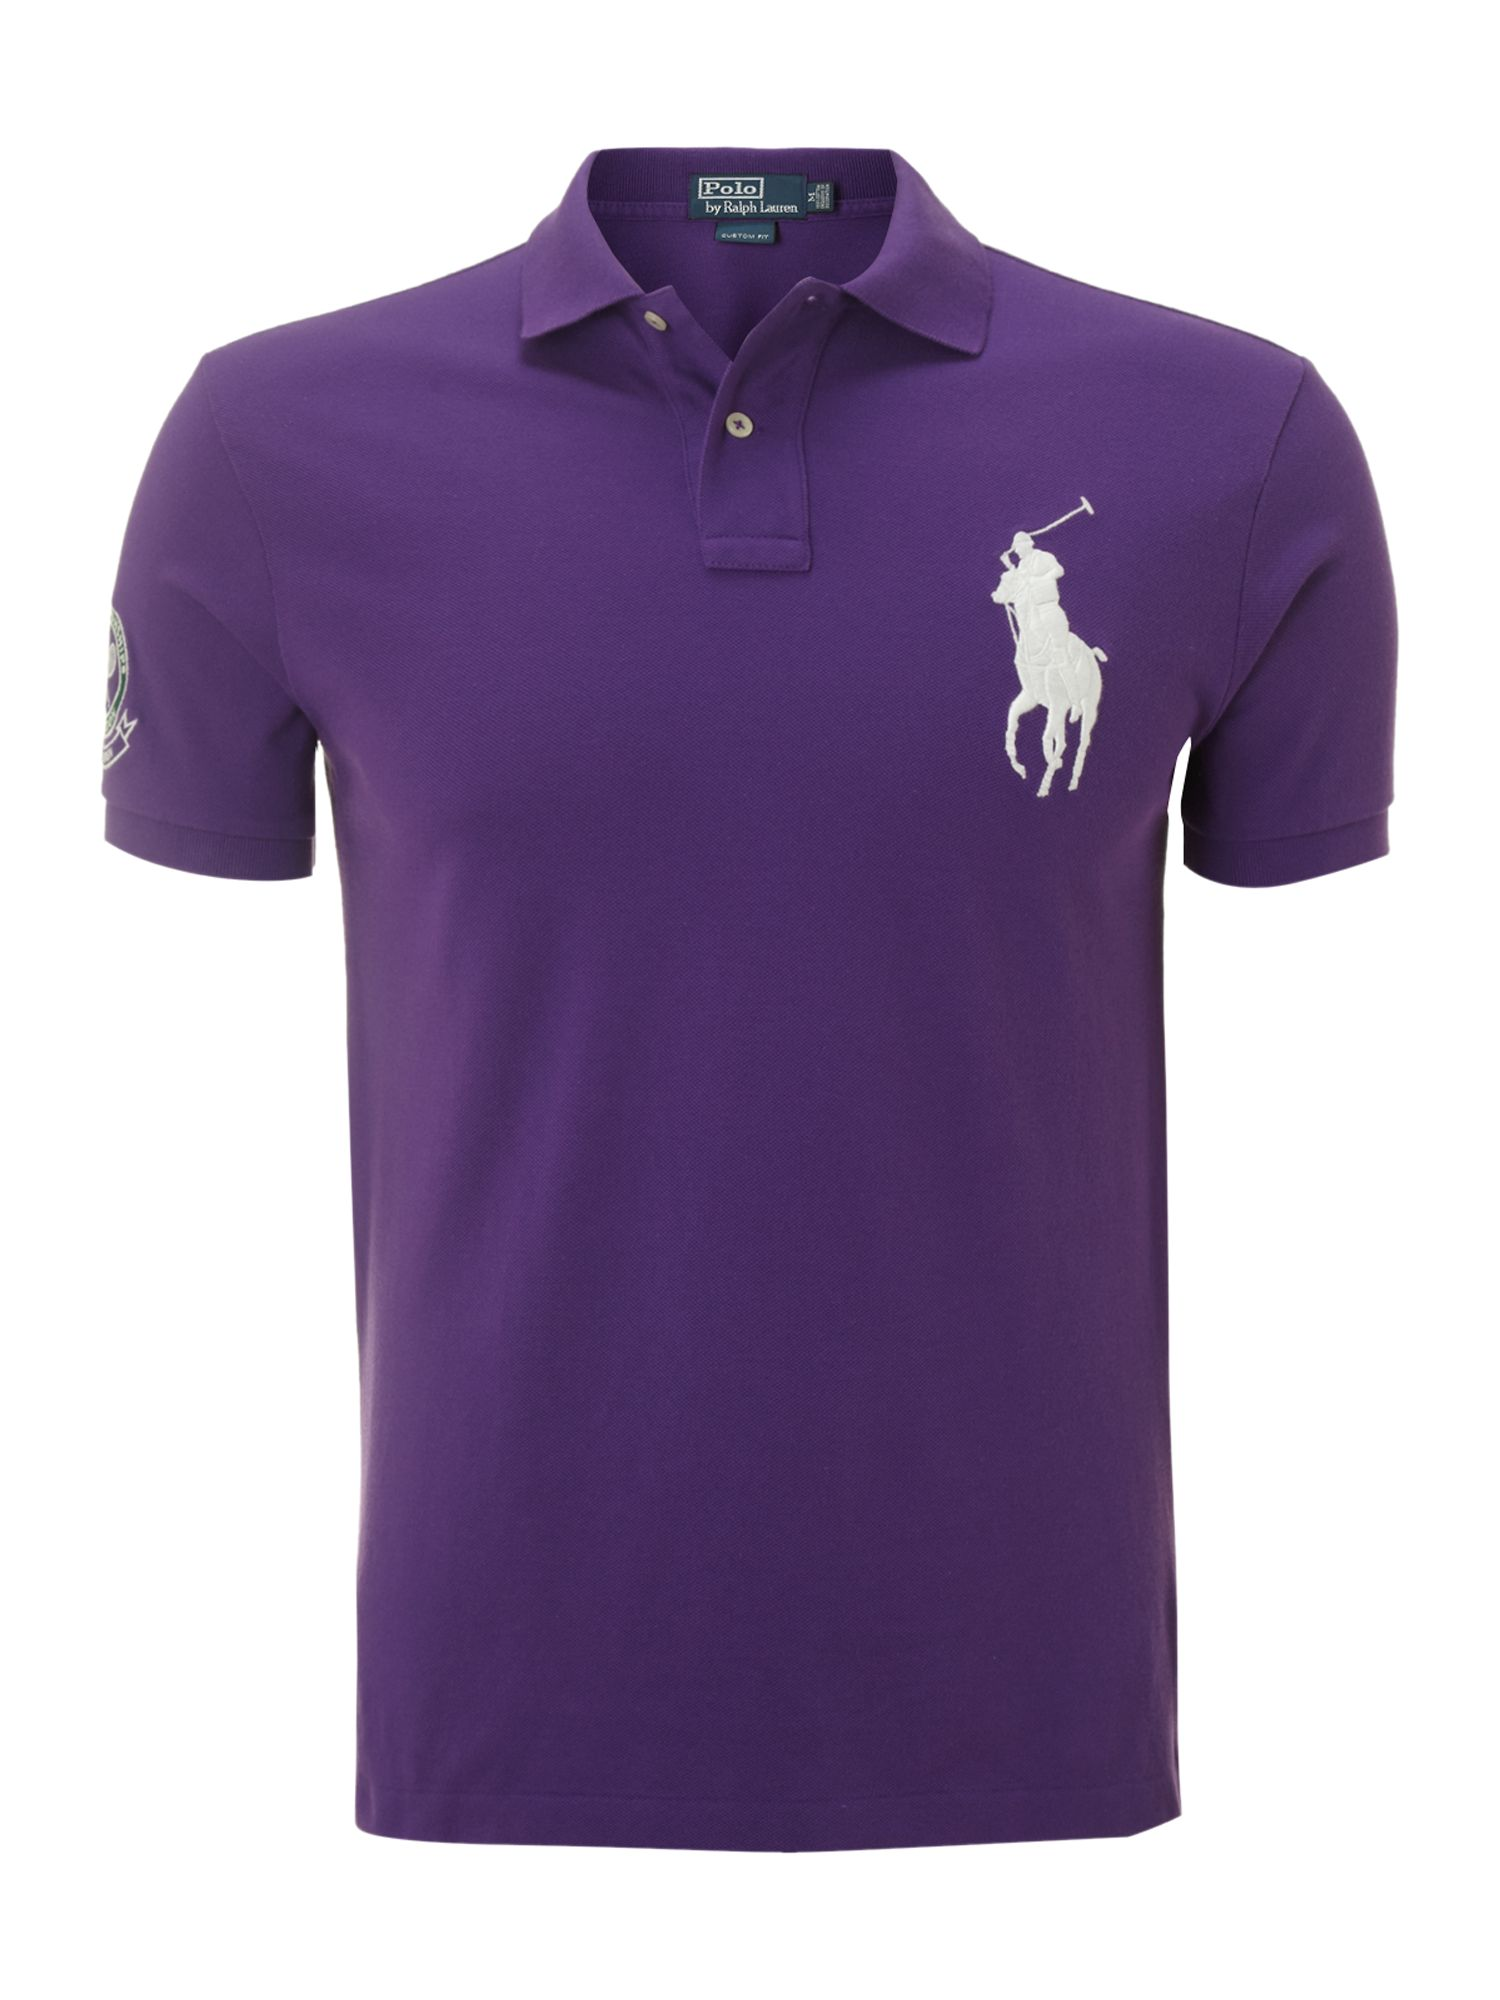 Polo ralph lauren wimbledon big pony mesh polo shirt in for Black ralph lauren shirt purple horse